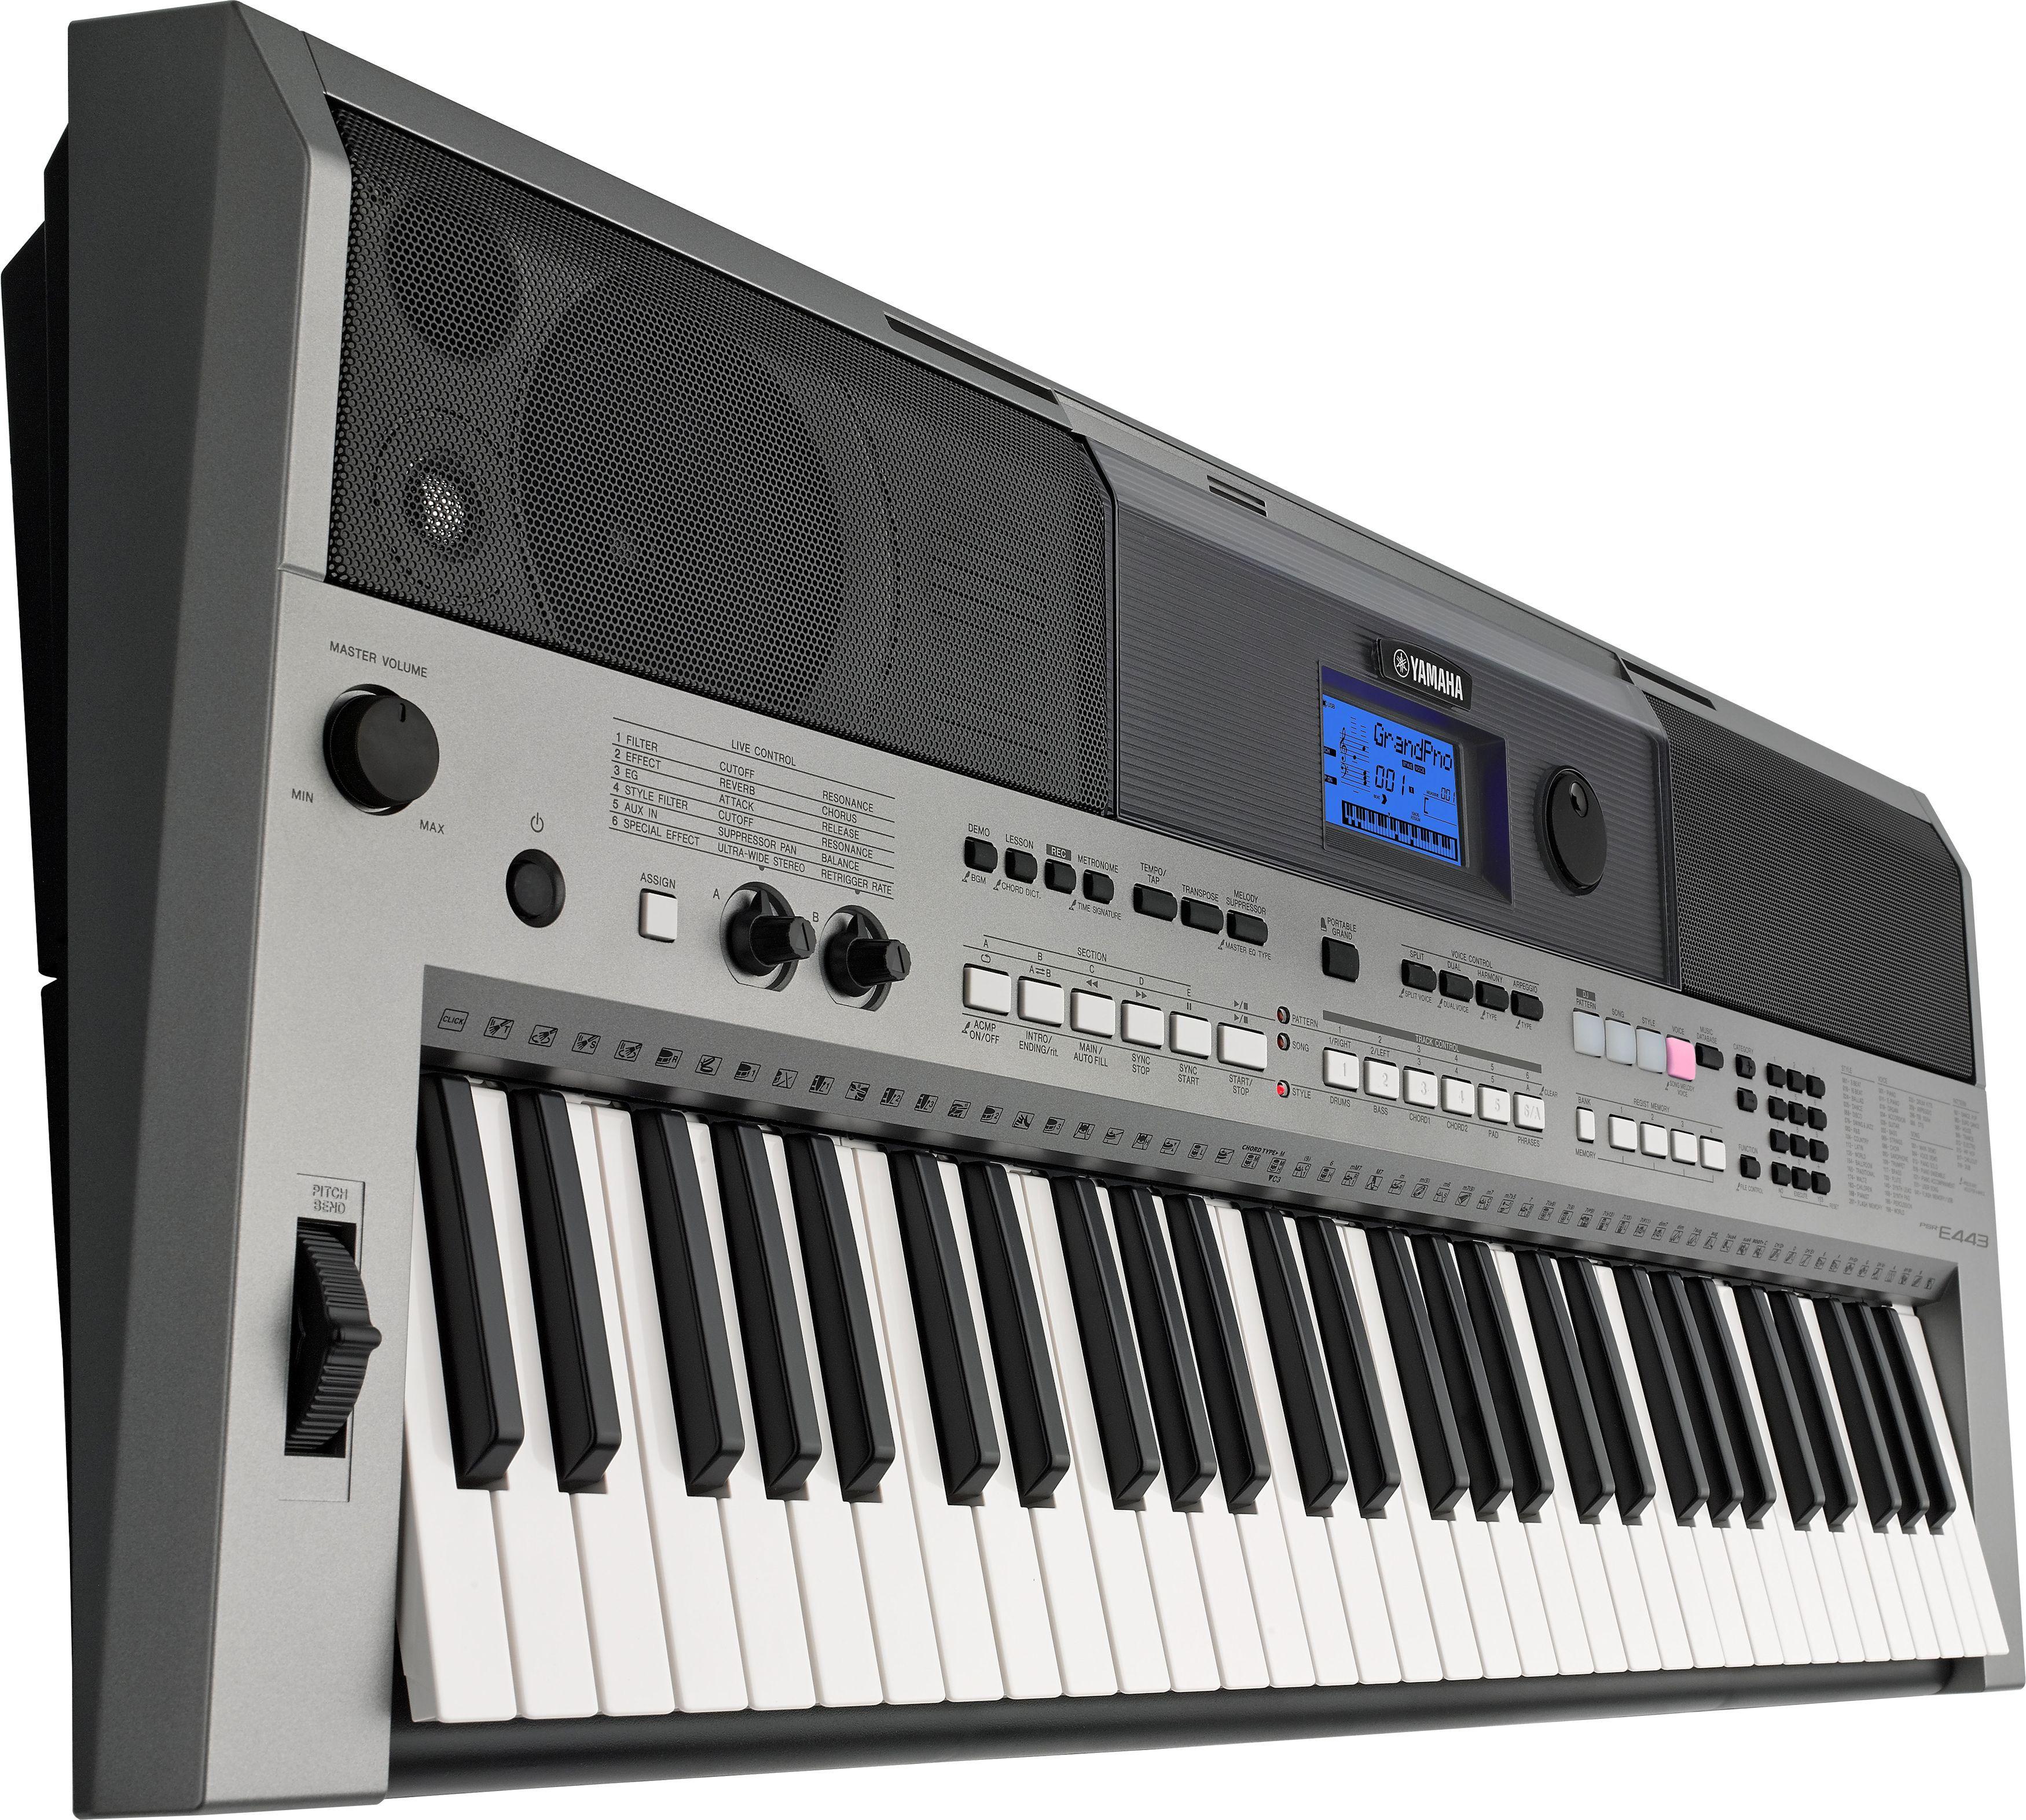 yamaha psr e443 portable keyboard with 61 keys best digital piano yamaha keyboard best. Black Bedroom Furniture Sets. Home Design Ideas